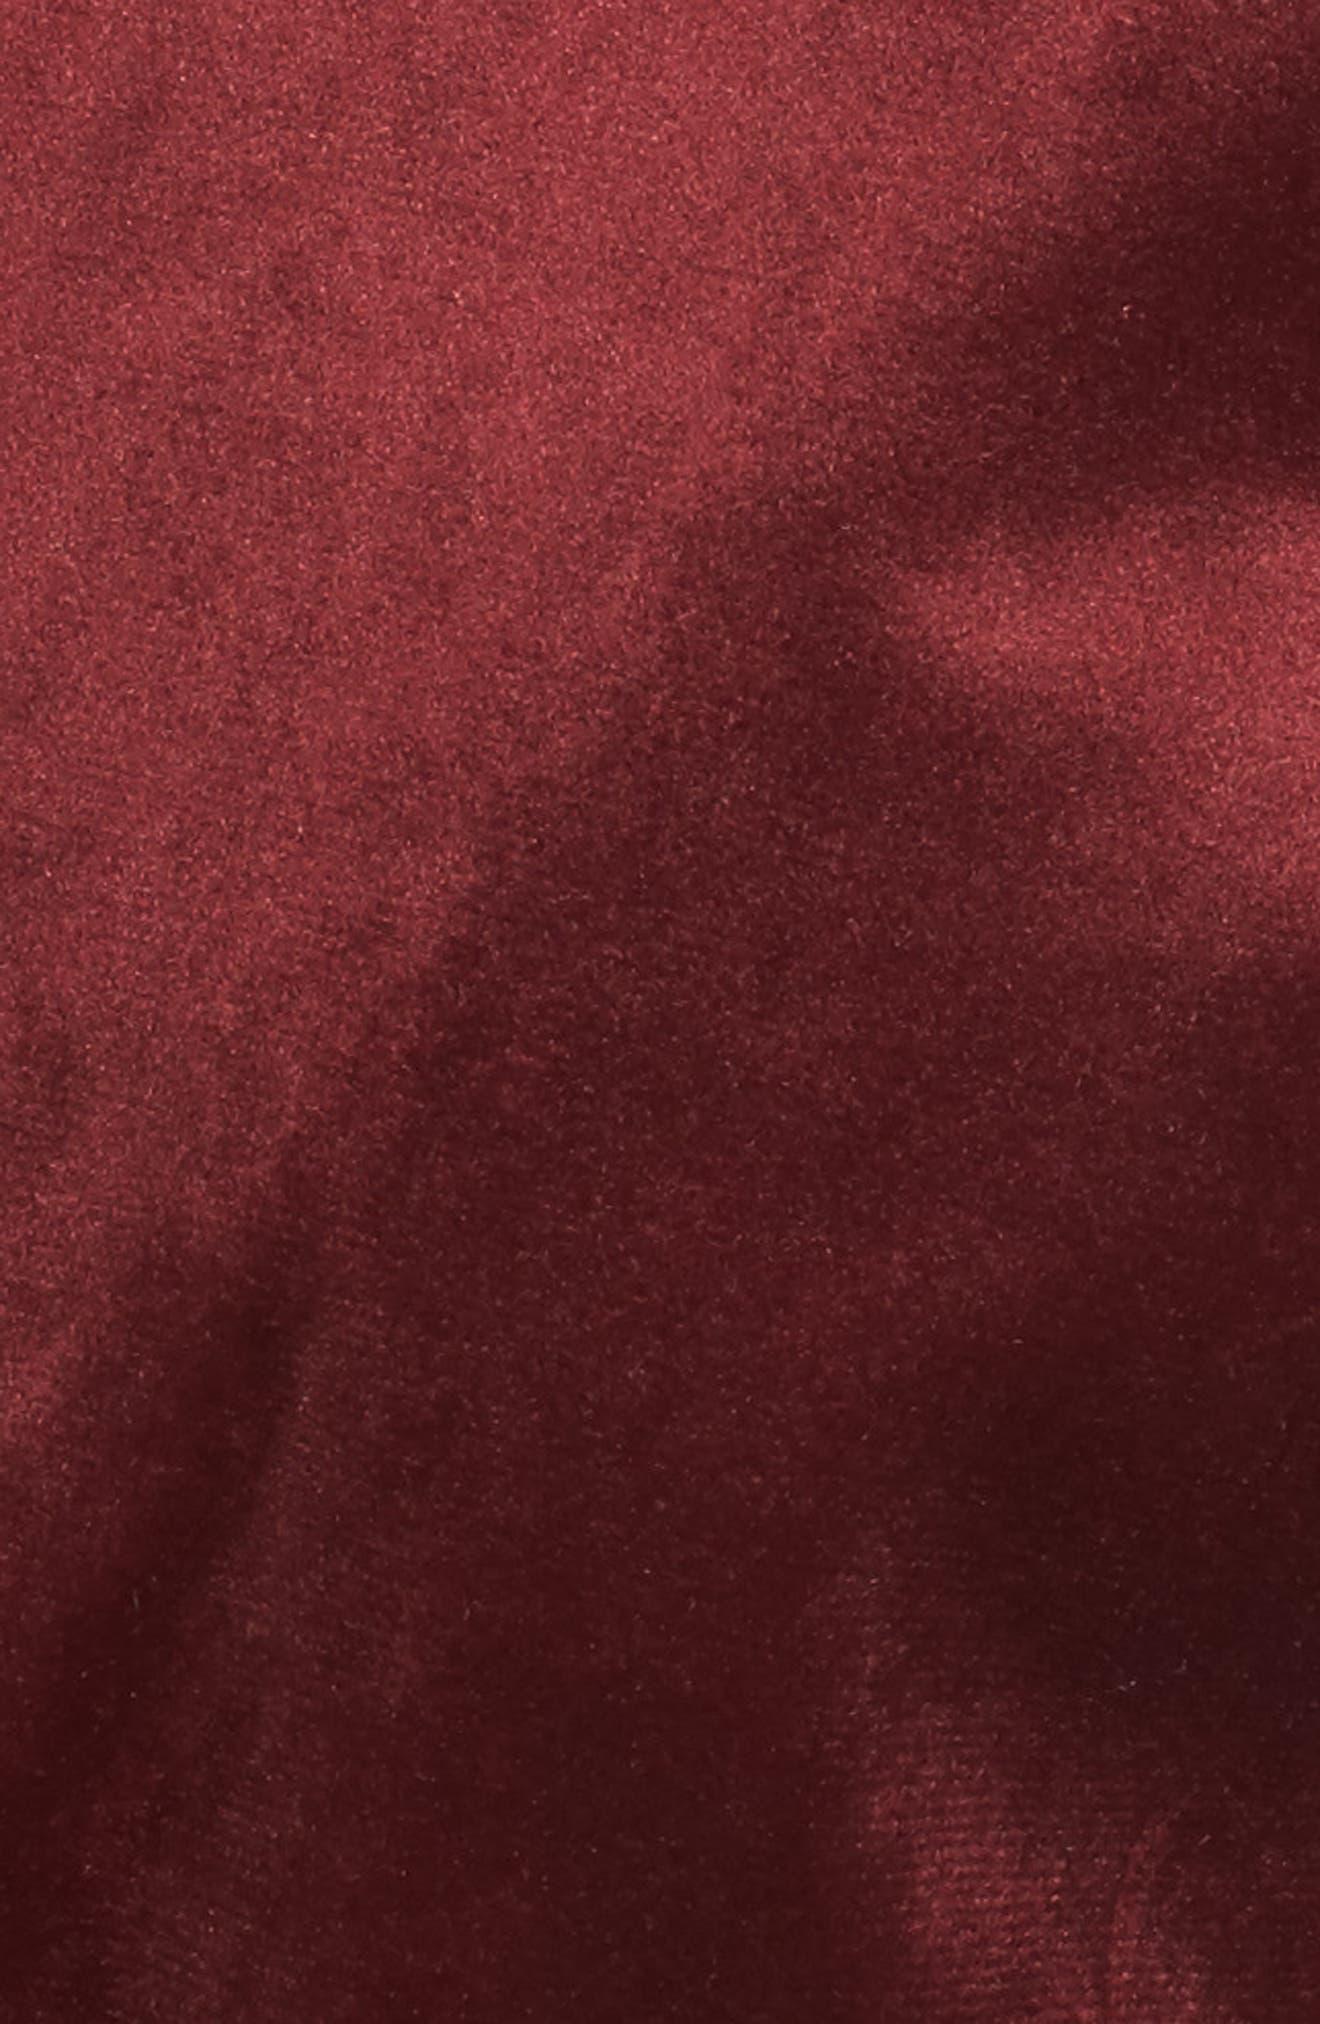 Lace Hem Velvet Wrap Top,                             Alternate thumbnail 5, color,                             Wine